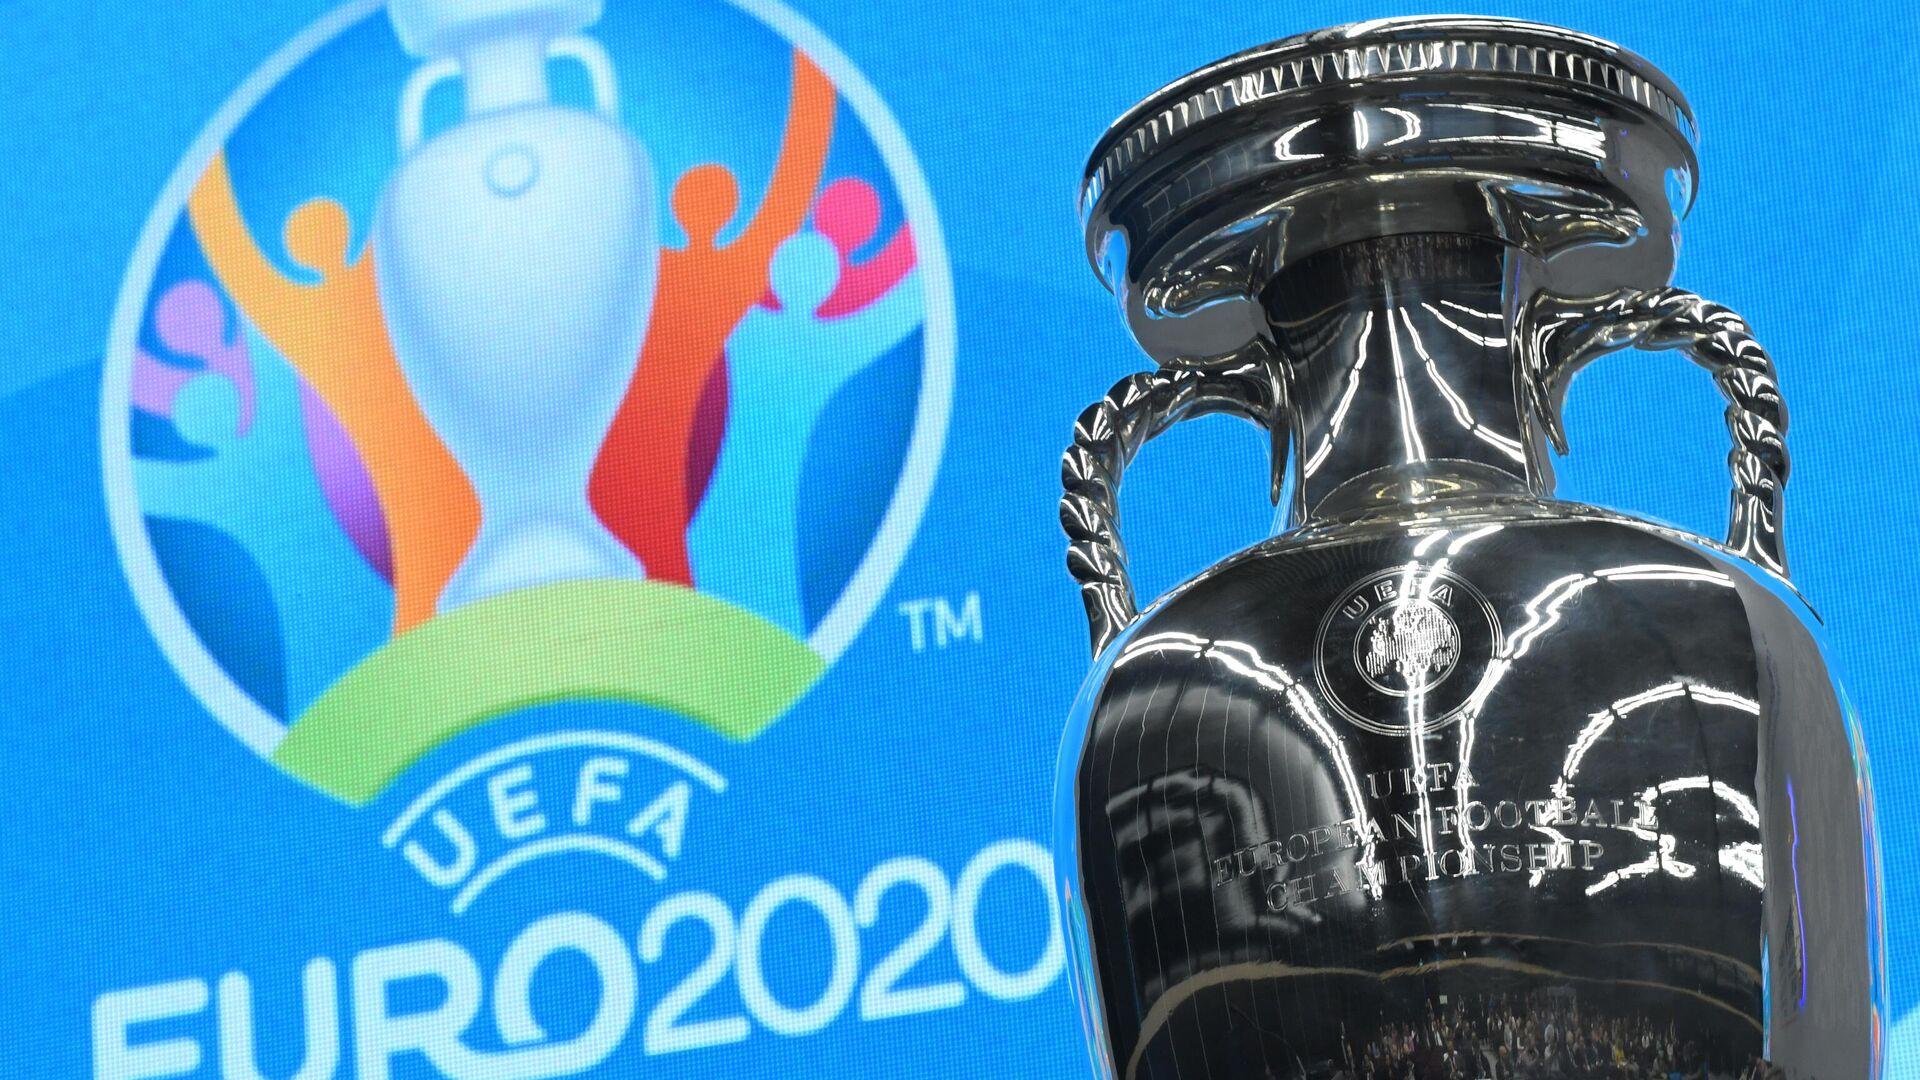 Кубок и логотип чемпионата Европы-2020 по футболу - РИА Новости, 1920, 17.05.2021